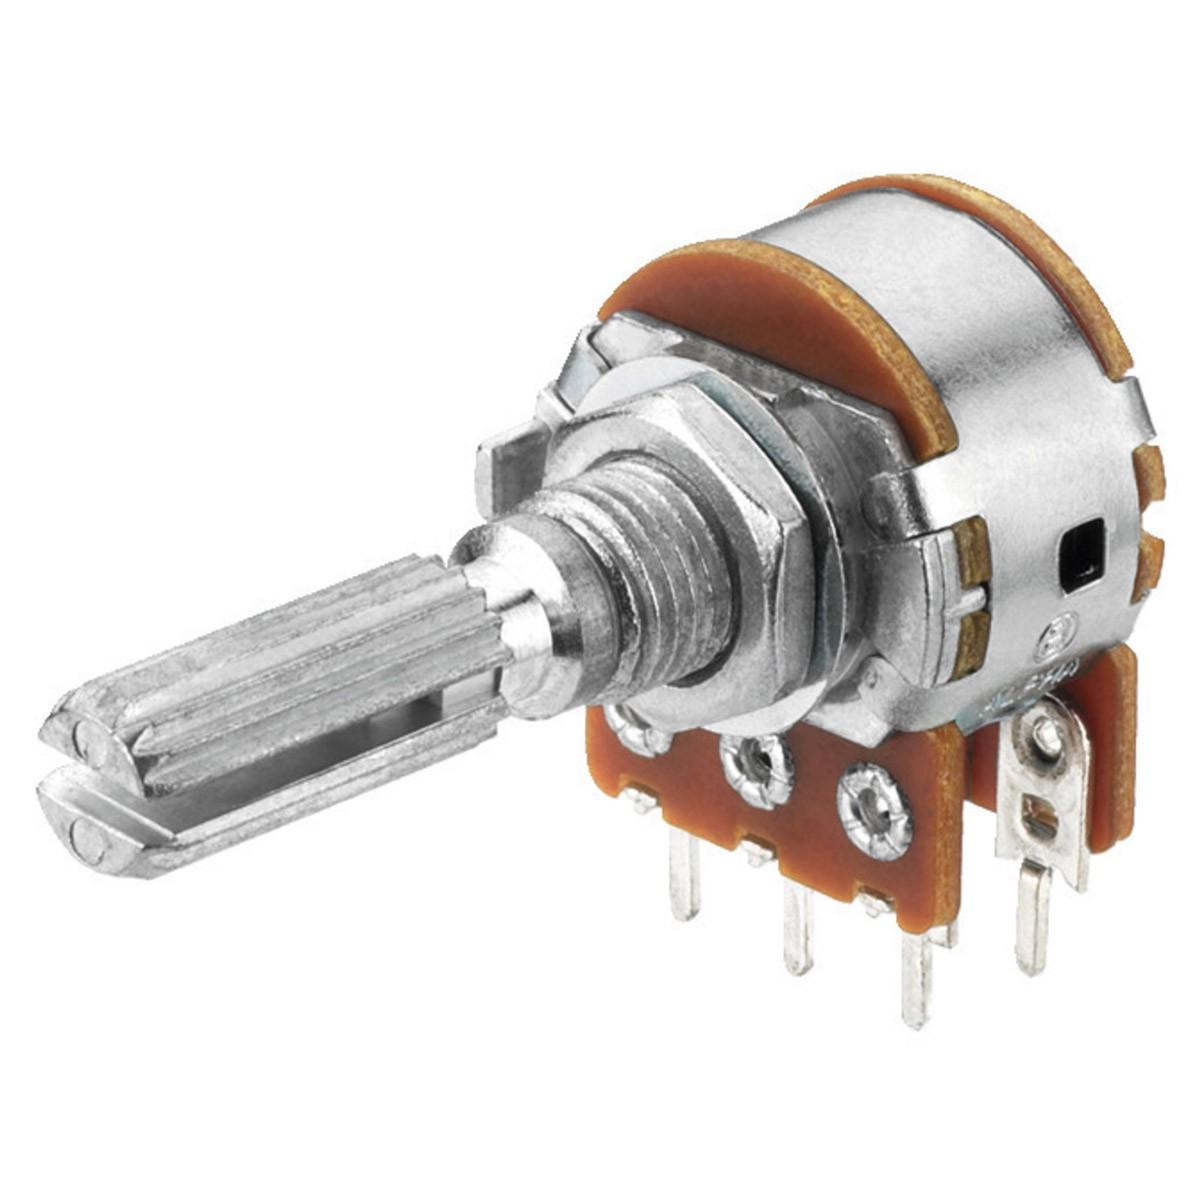 Stereo potentiometer VRB-101S10 10k ohm center point